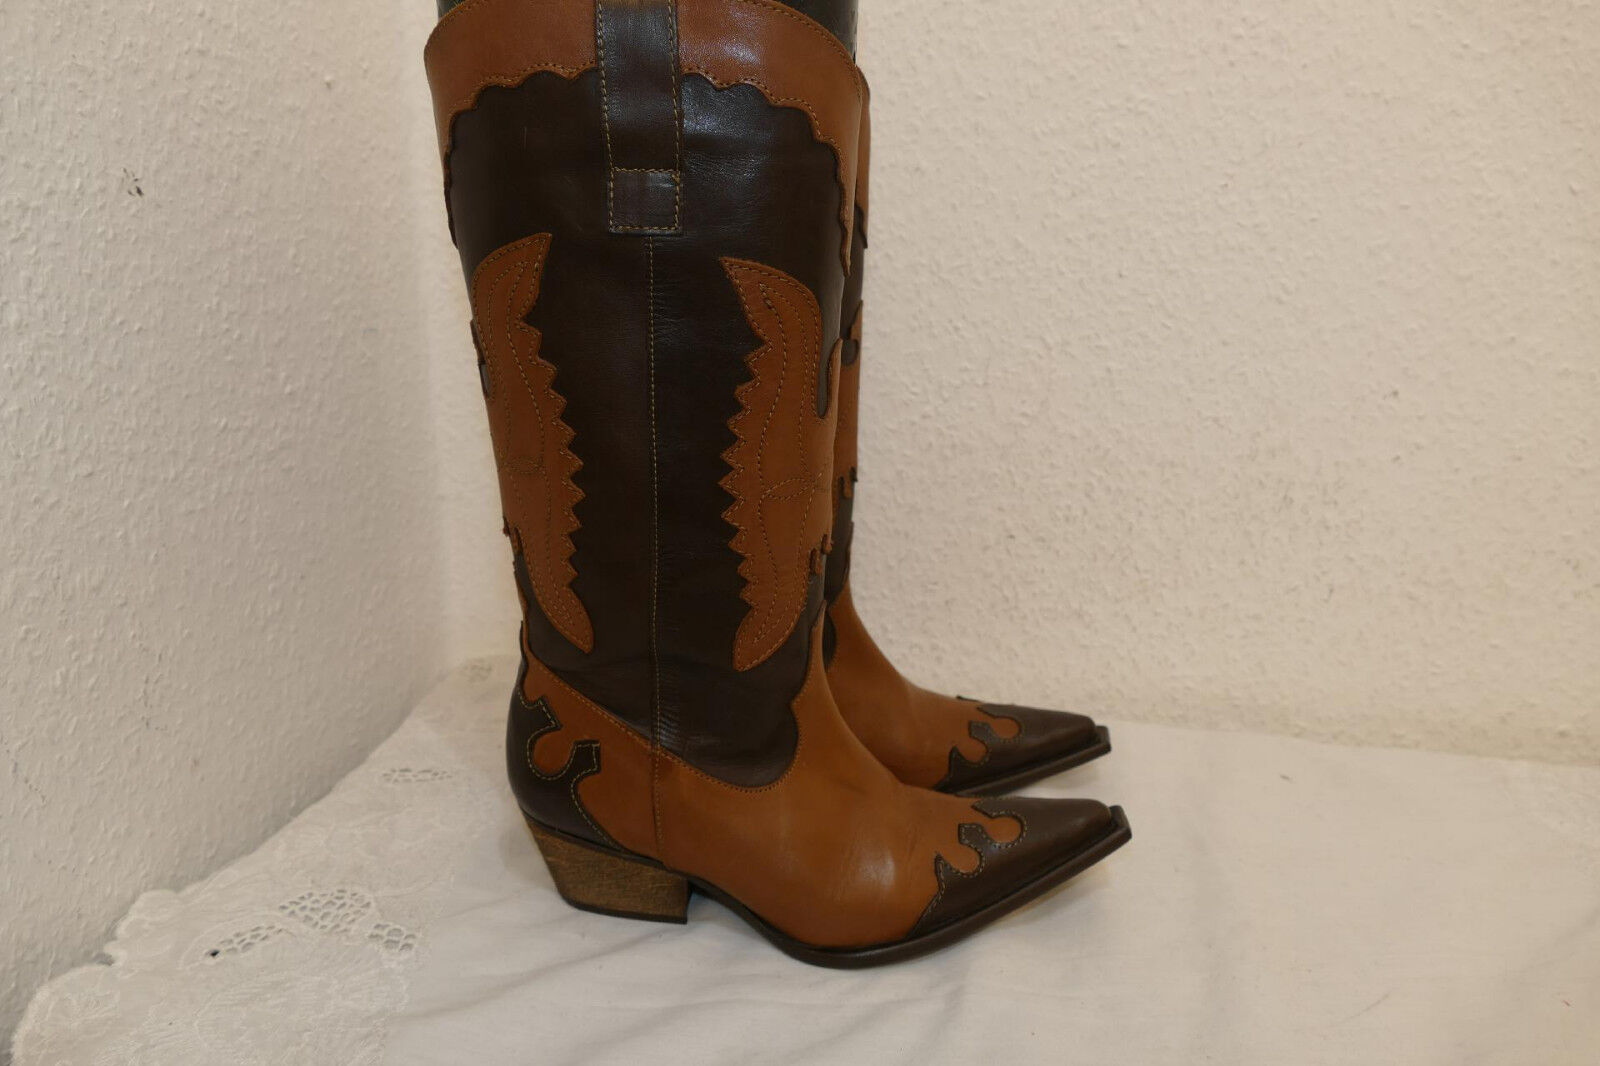 752---Vannini Cowboy Gr 37    1x getragen  Cowboystiefel Hingucker   Leder butte